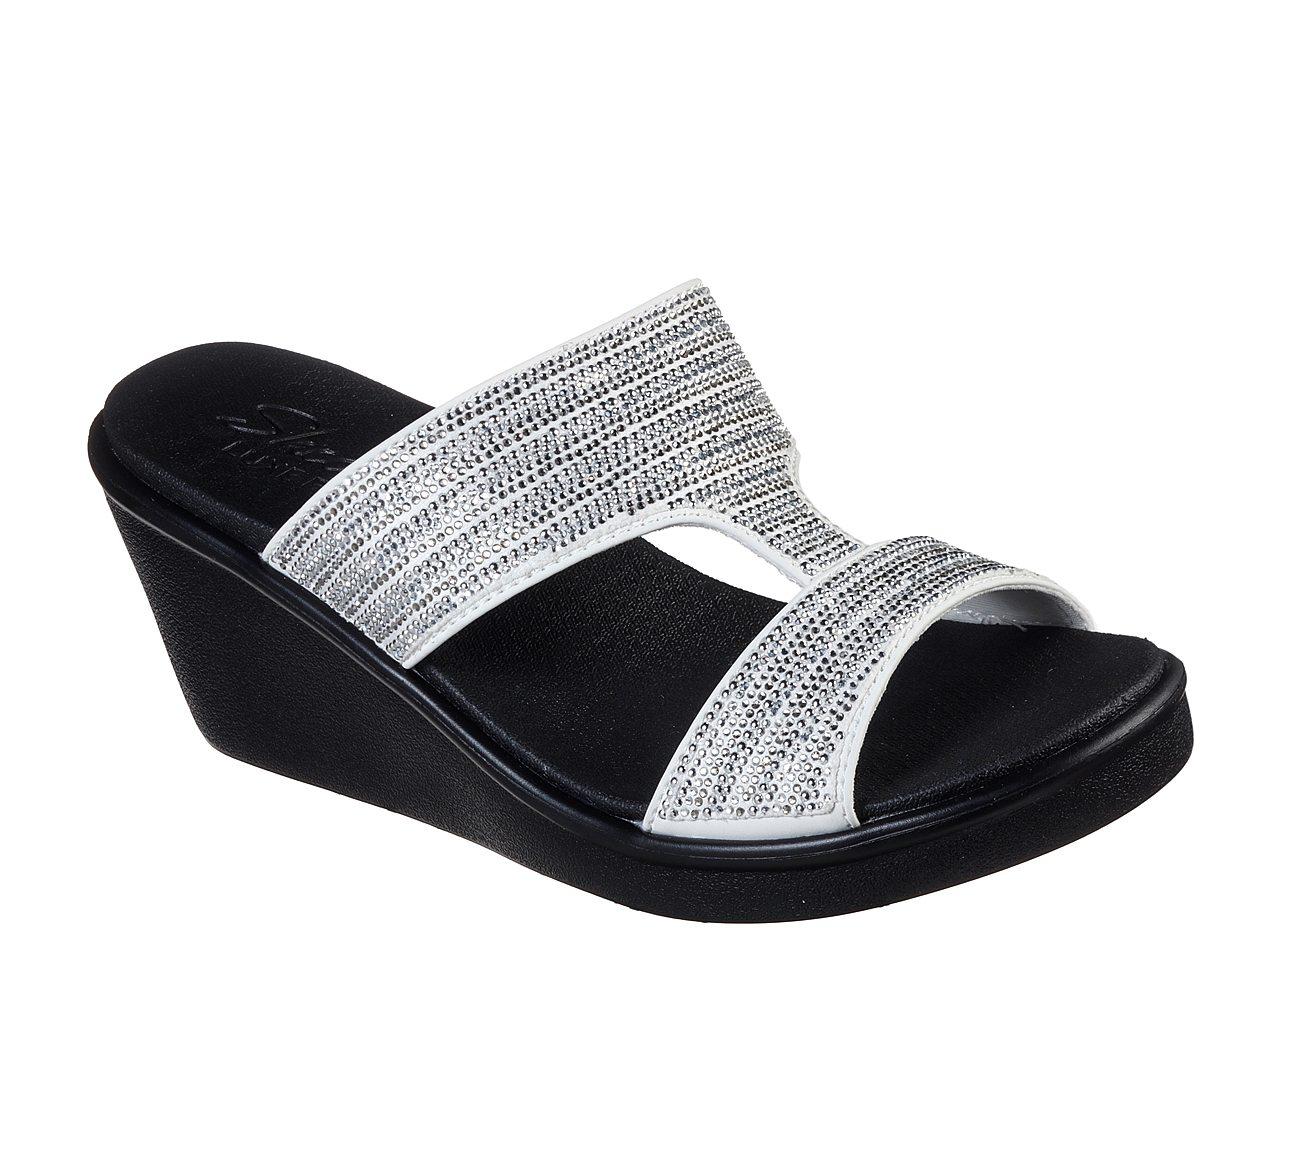 Antología Fácil de leer Parque jurásico  Buy SKECHERS Rumble On - Bling Gal SKECHERS Cali Shoes